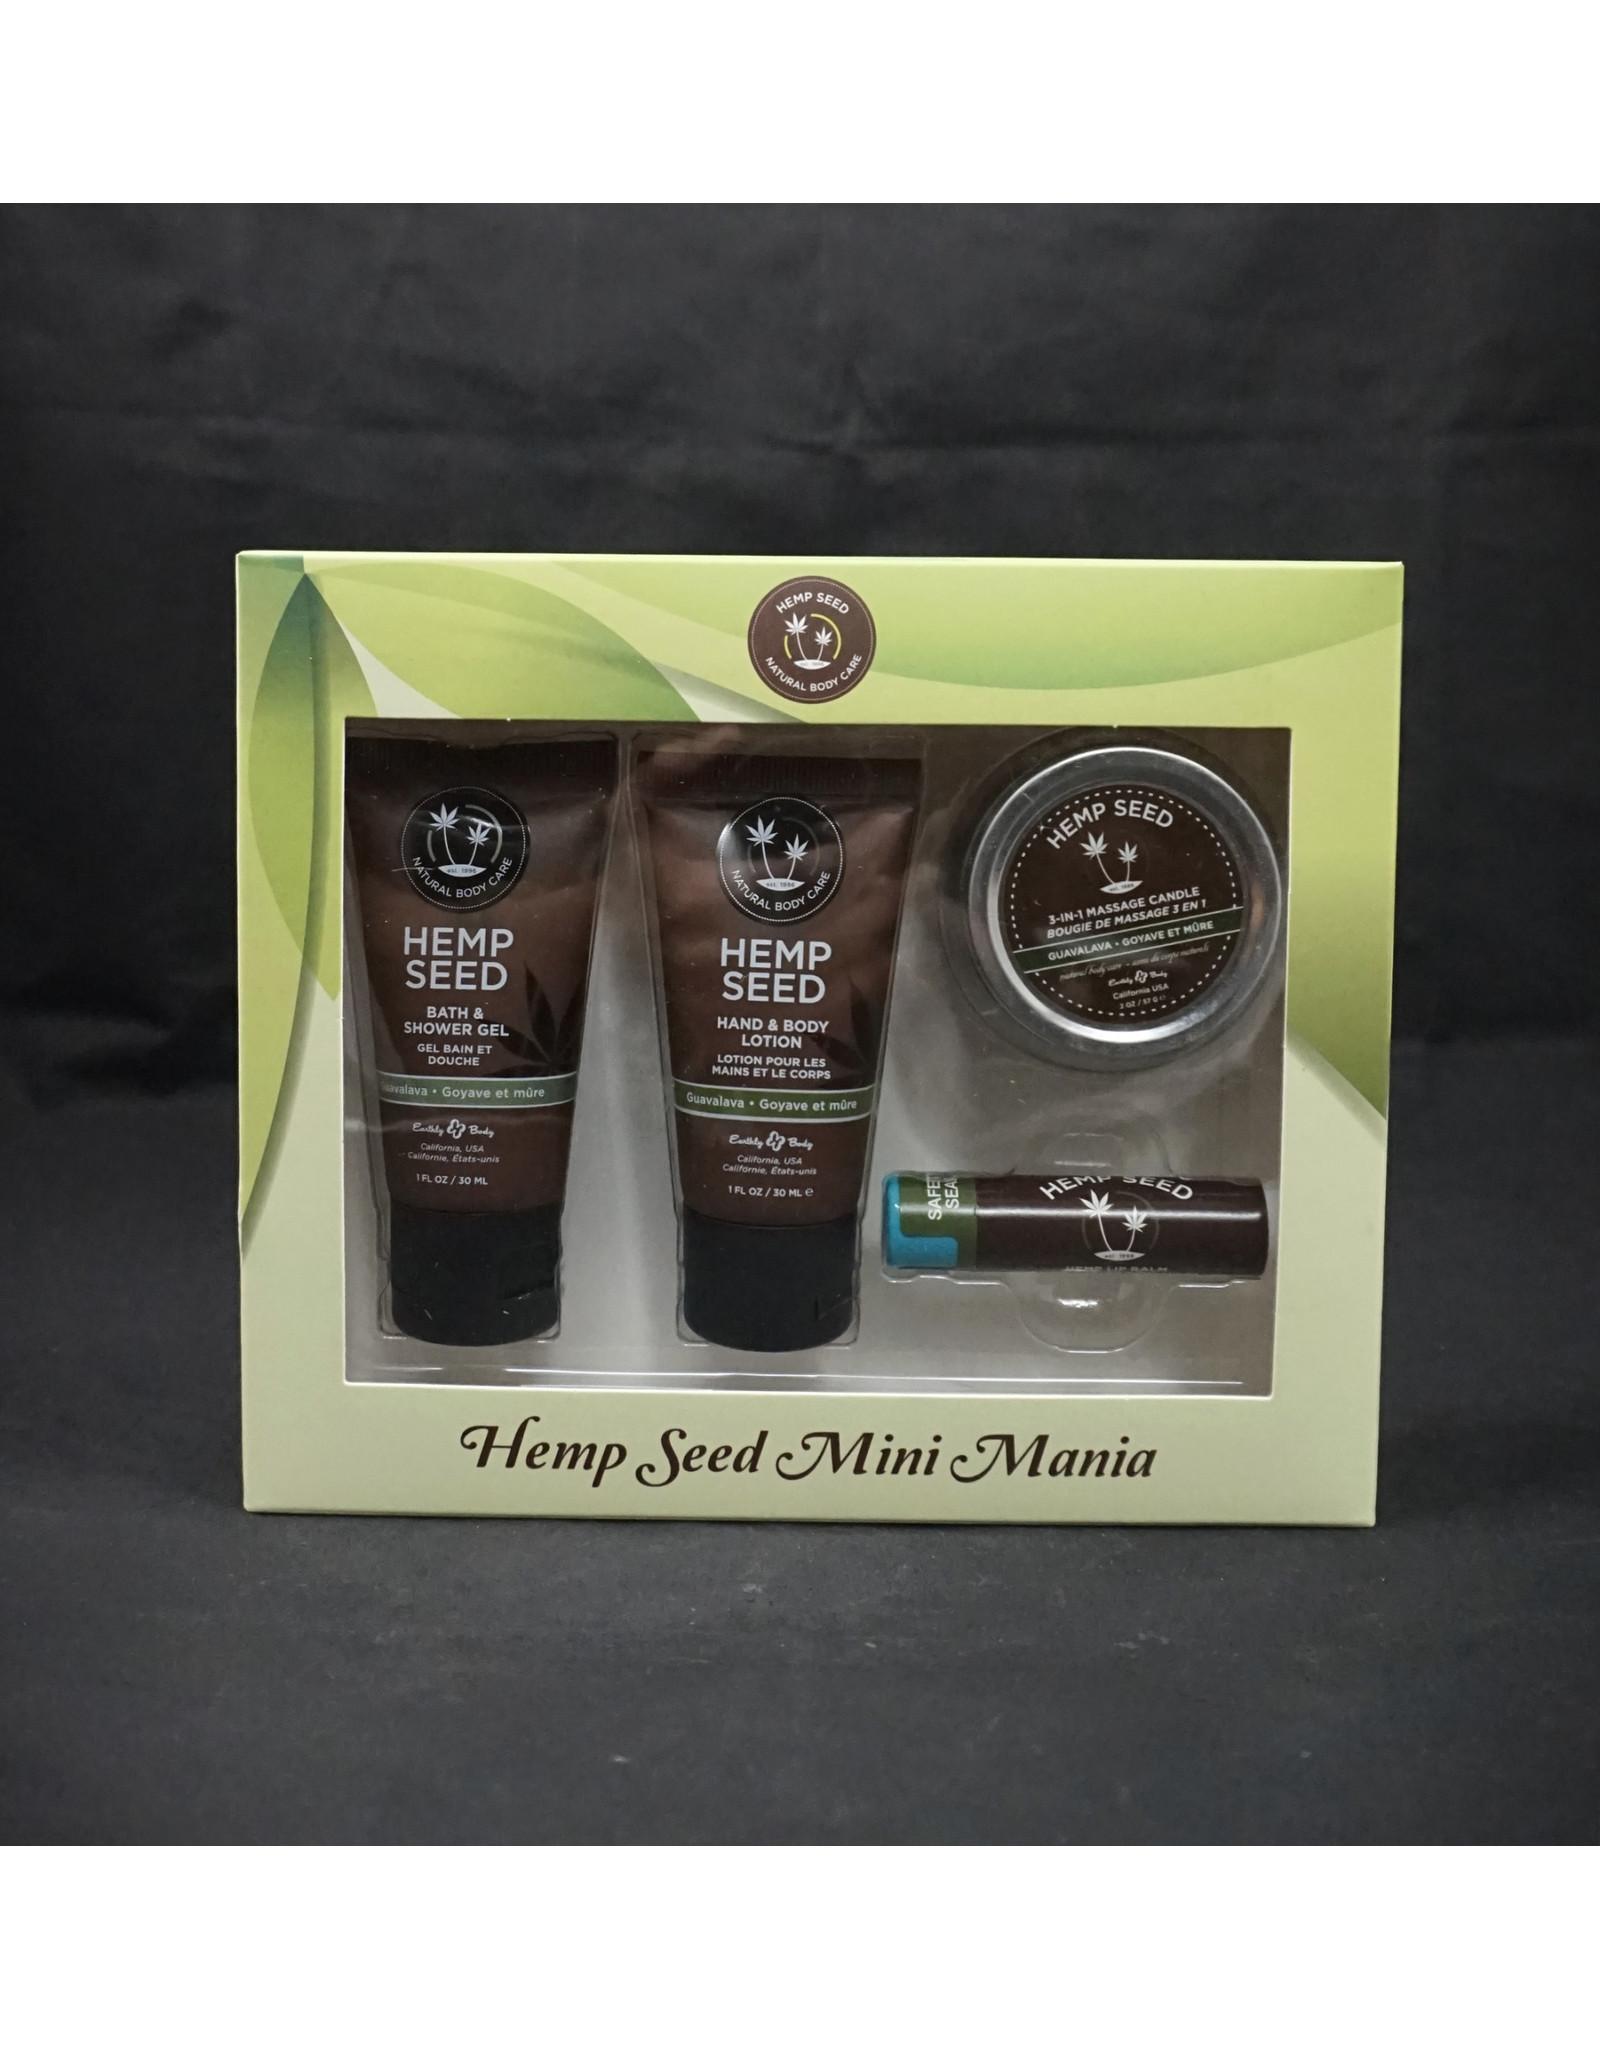 Earthly Body Hemp Seed Mini Mania Gift Set - Guavalava